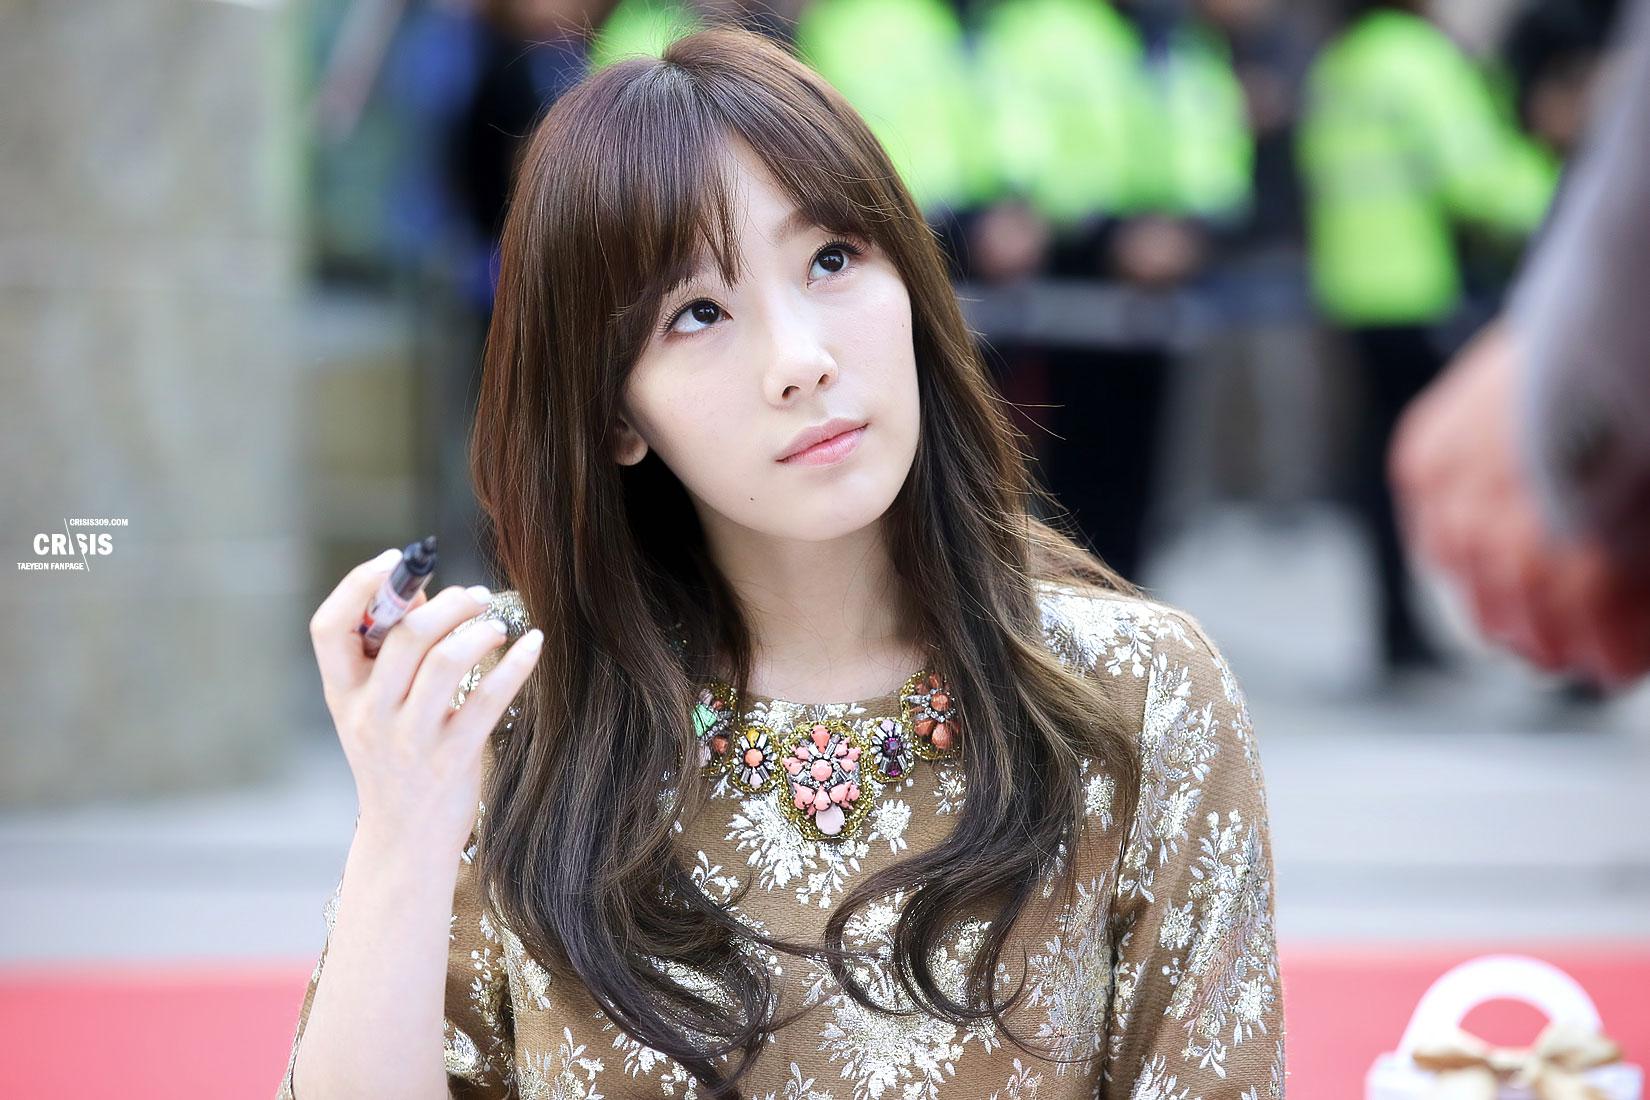 Girls Generation Tiffany Wallpaper Taeyeon Lotte Department Store Fansign Snsd Pics